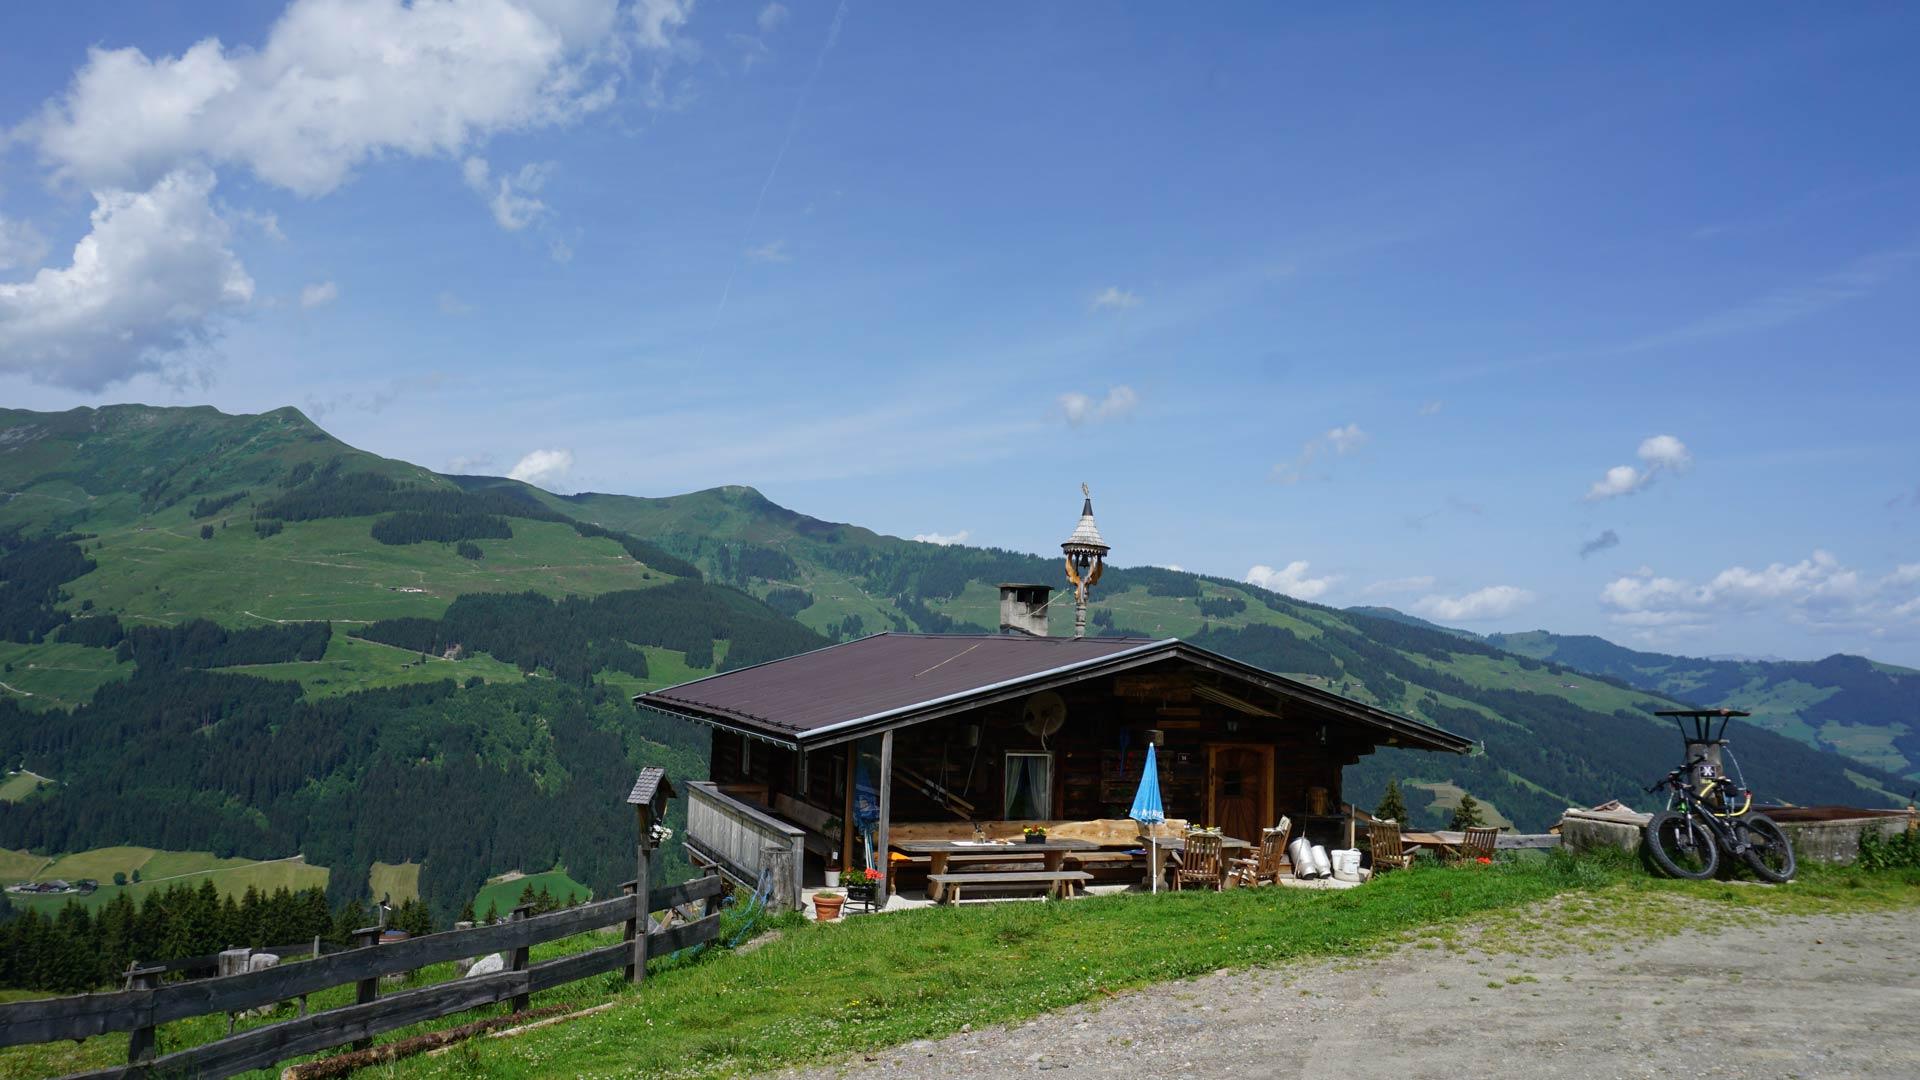 Haus Lukas - Hopfgarten im Brixental - in den Kitzbheler Alpen